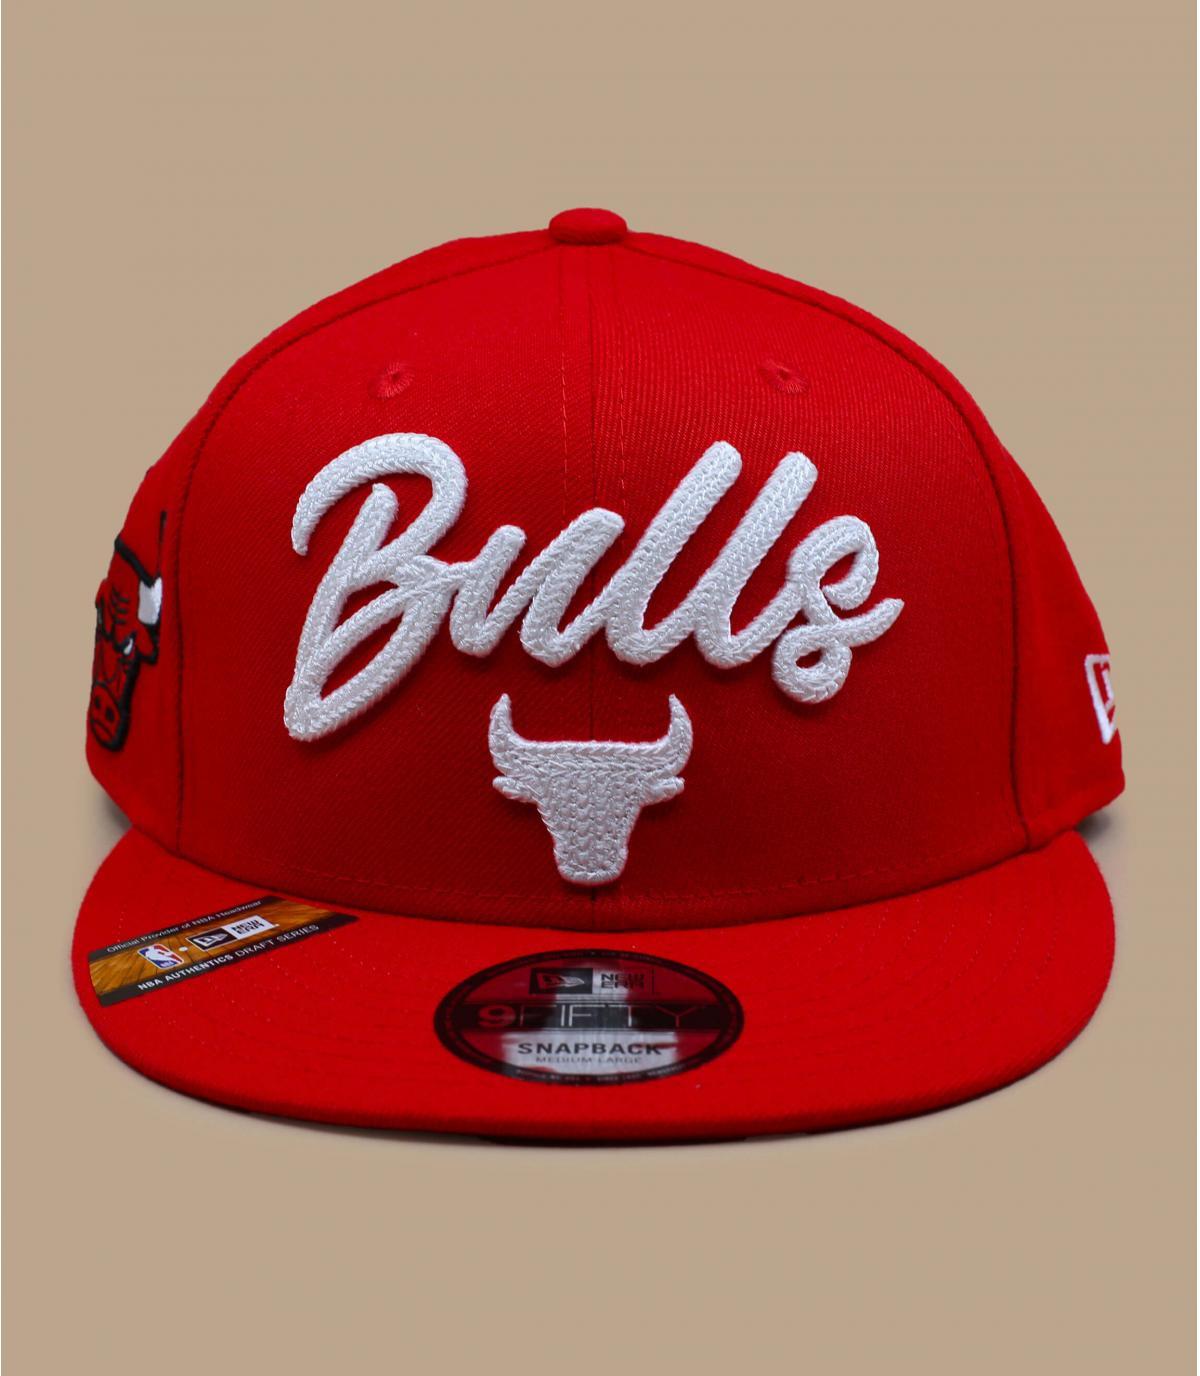 Détails Snapback NBA Draft Bulls 950 - image 2